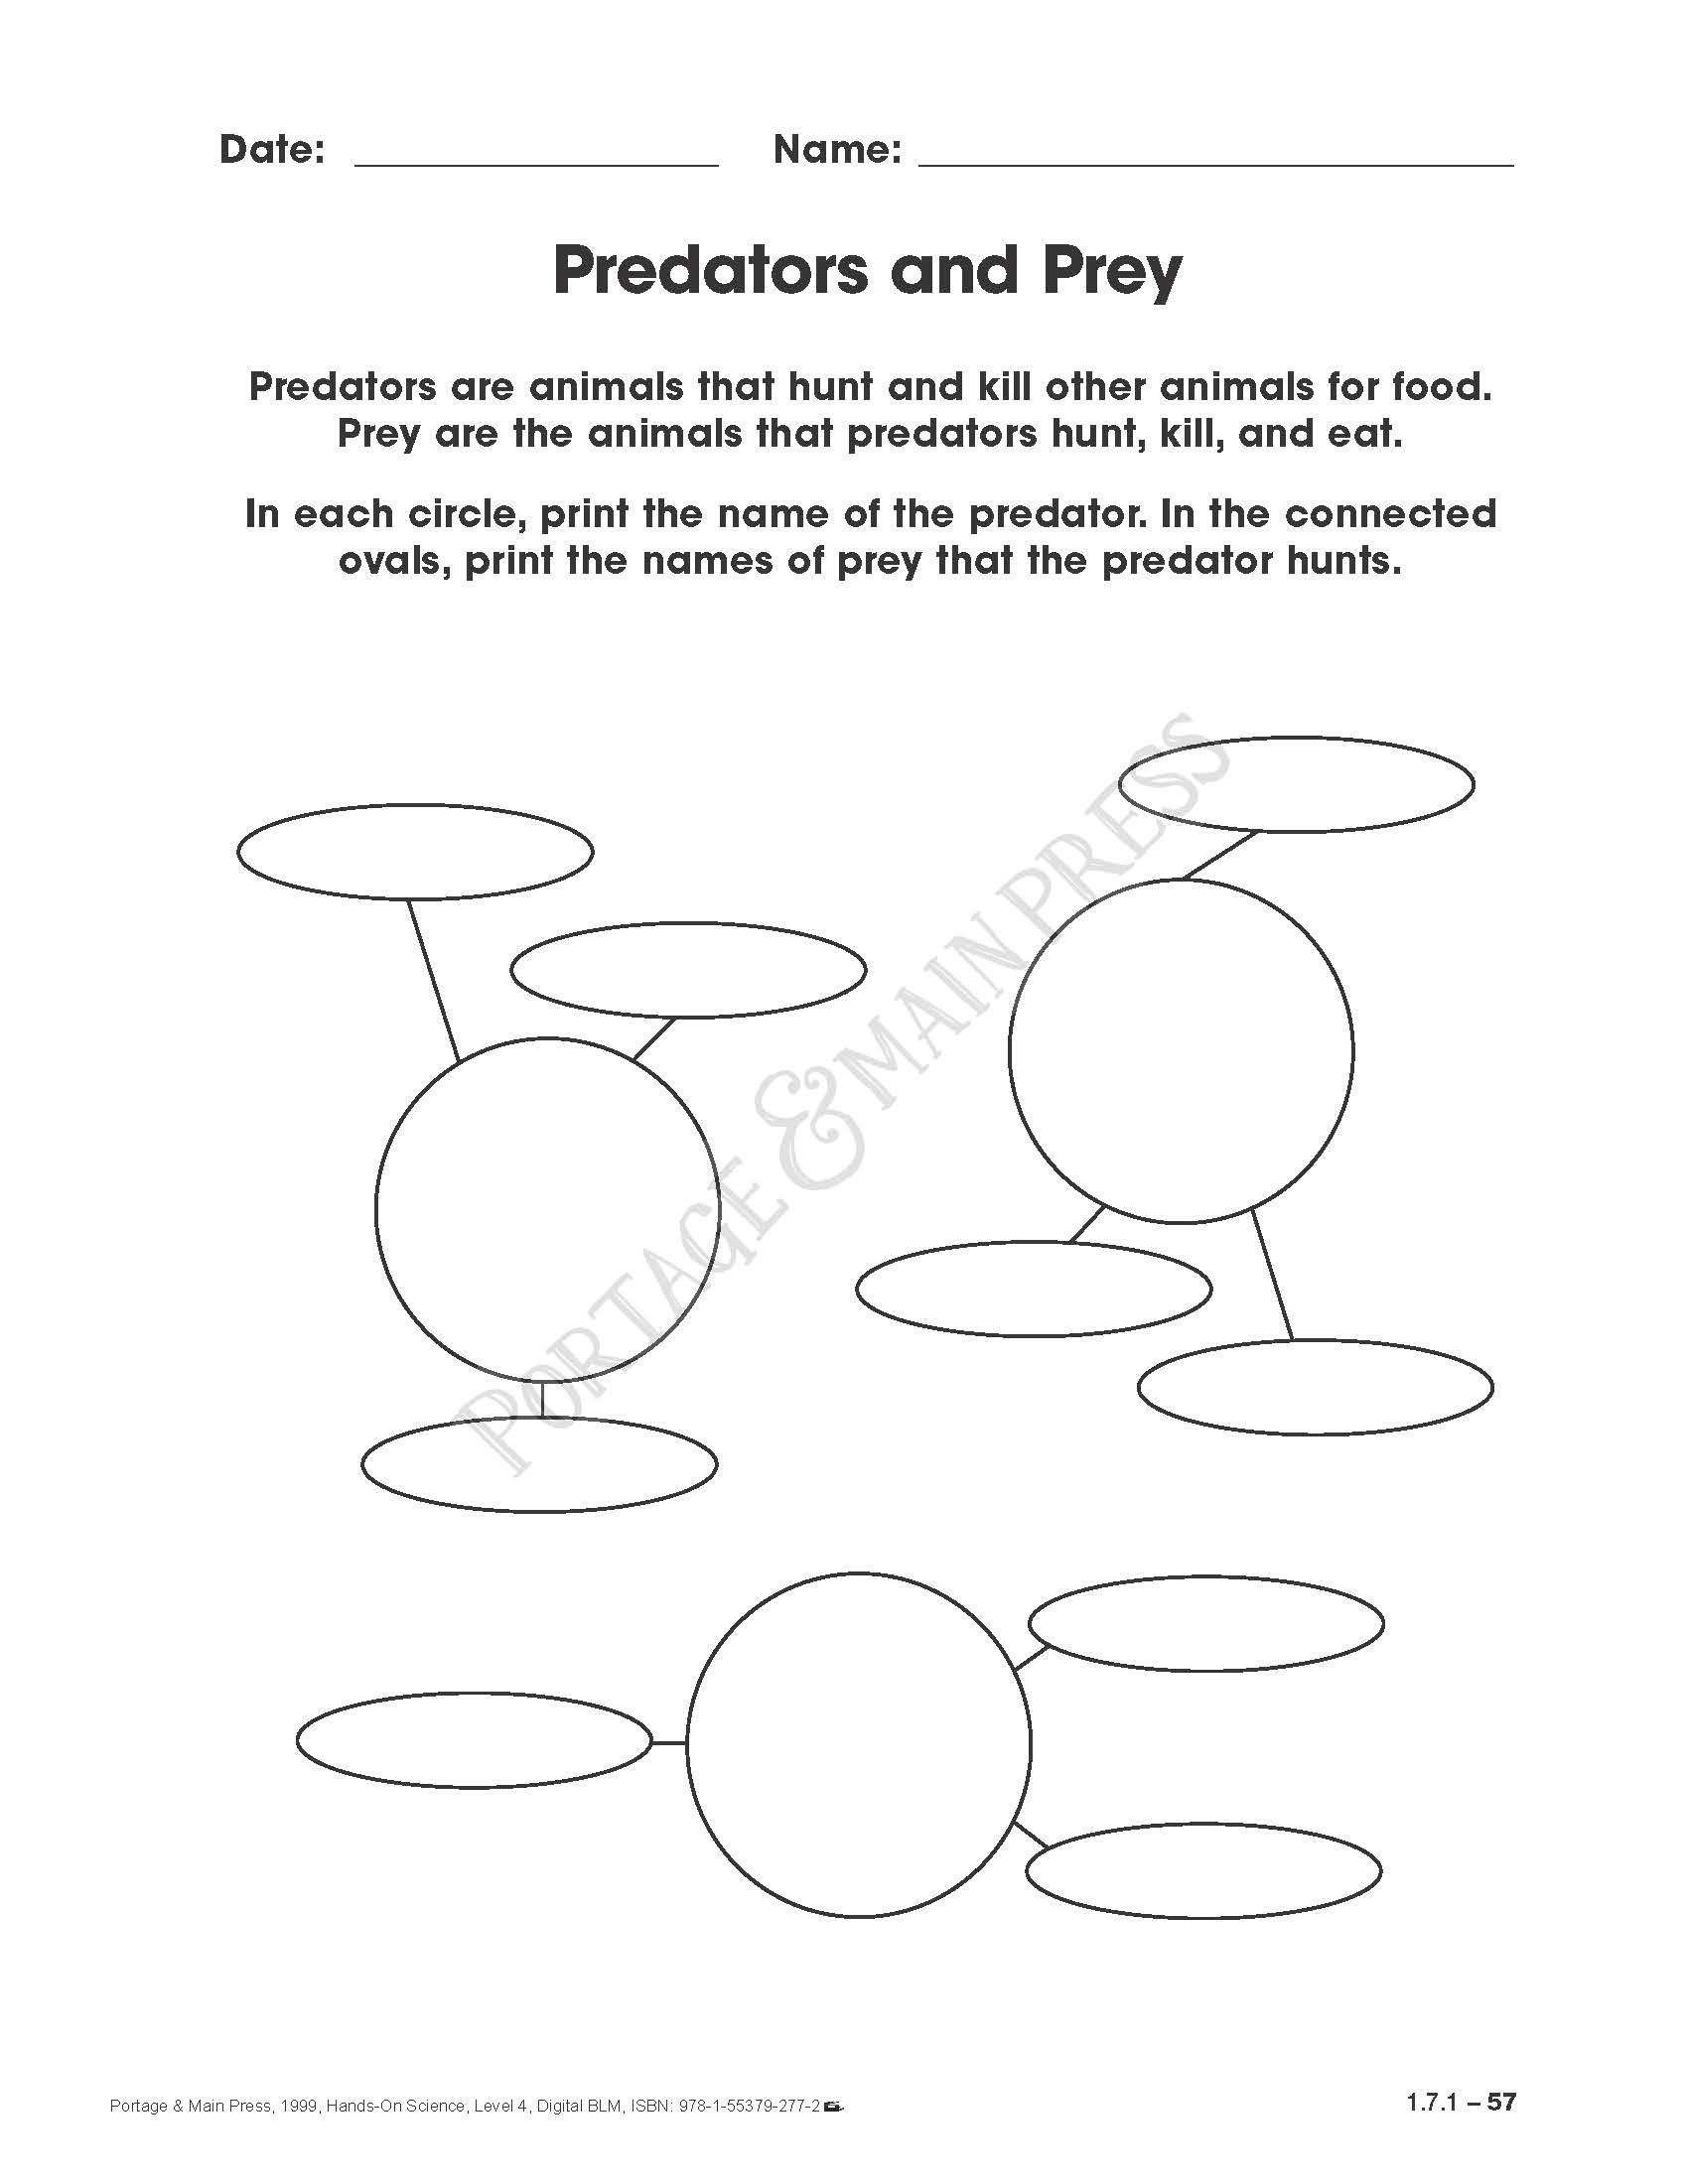 Predator Prey Graph Worksheet Grade 4 Science Predators And Prey Activity Sheet Science Skills Fun Science Kids Worksheets Printables